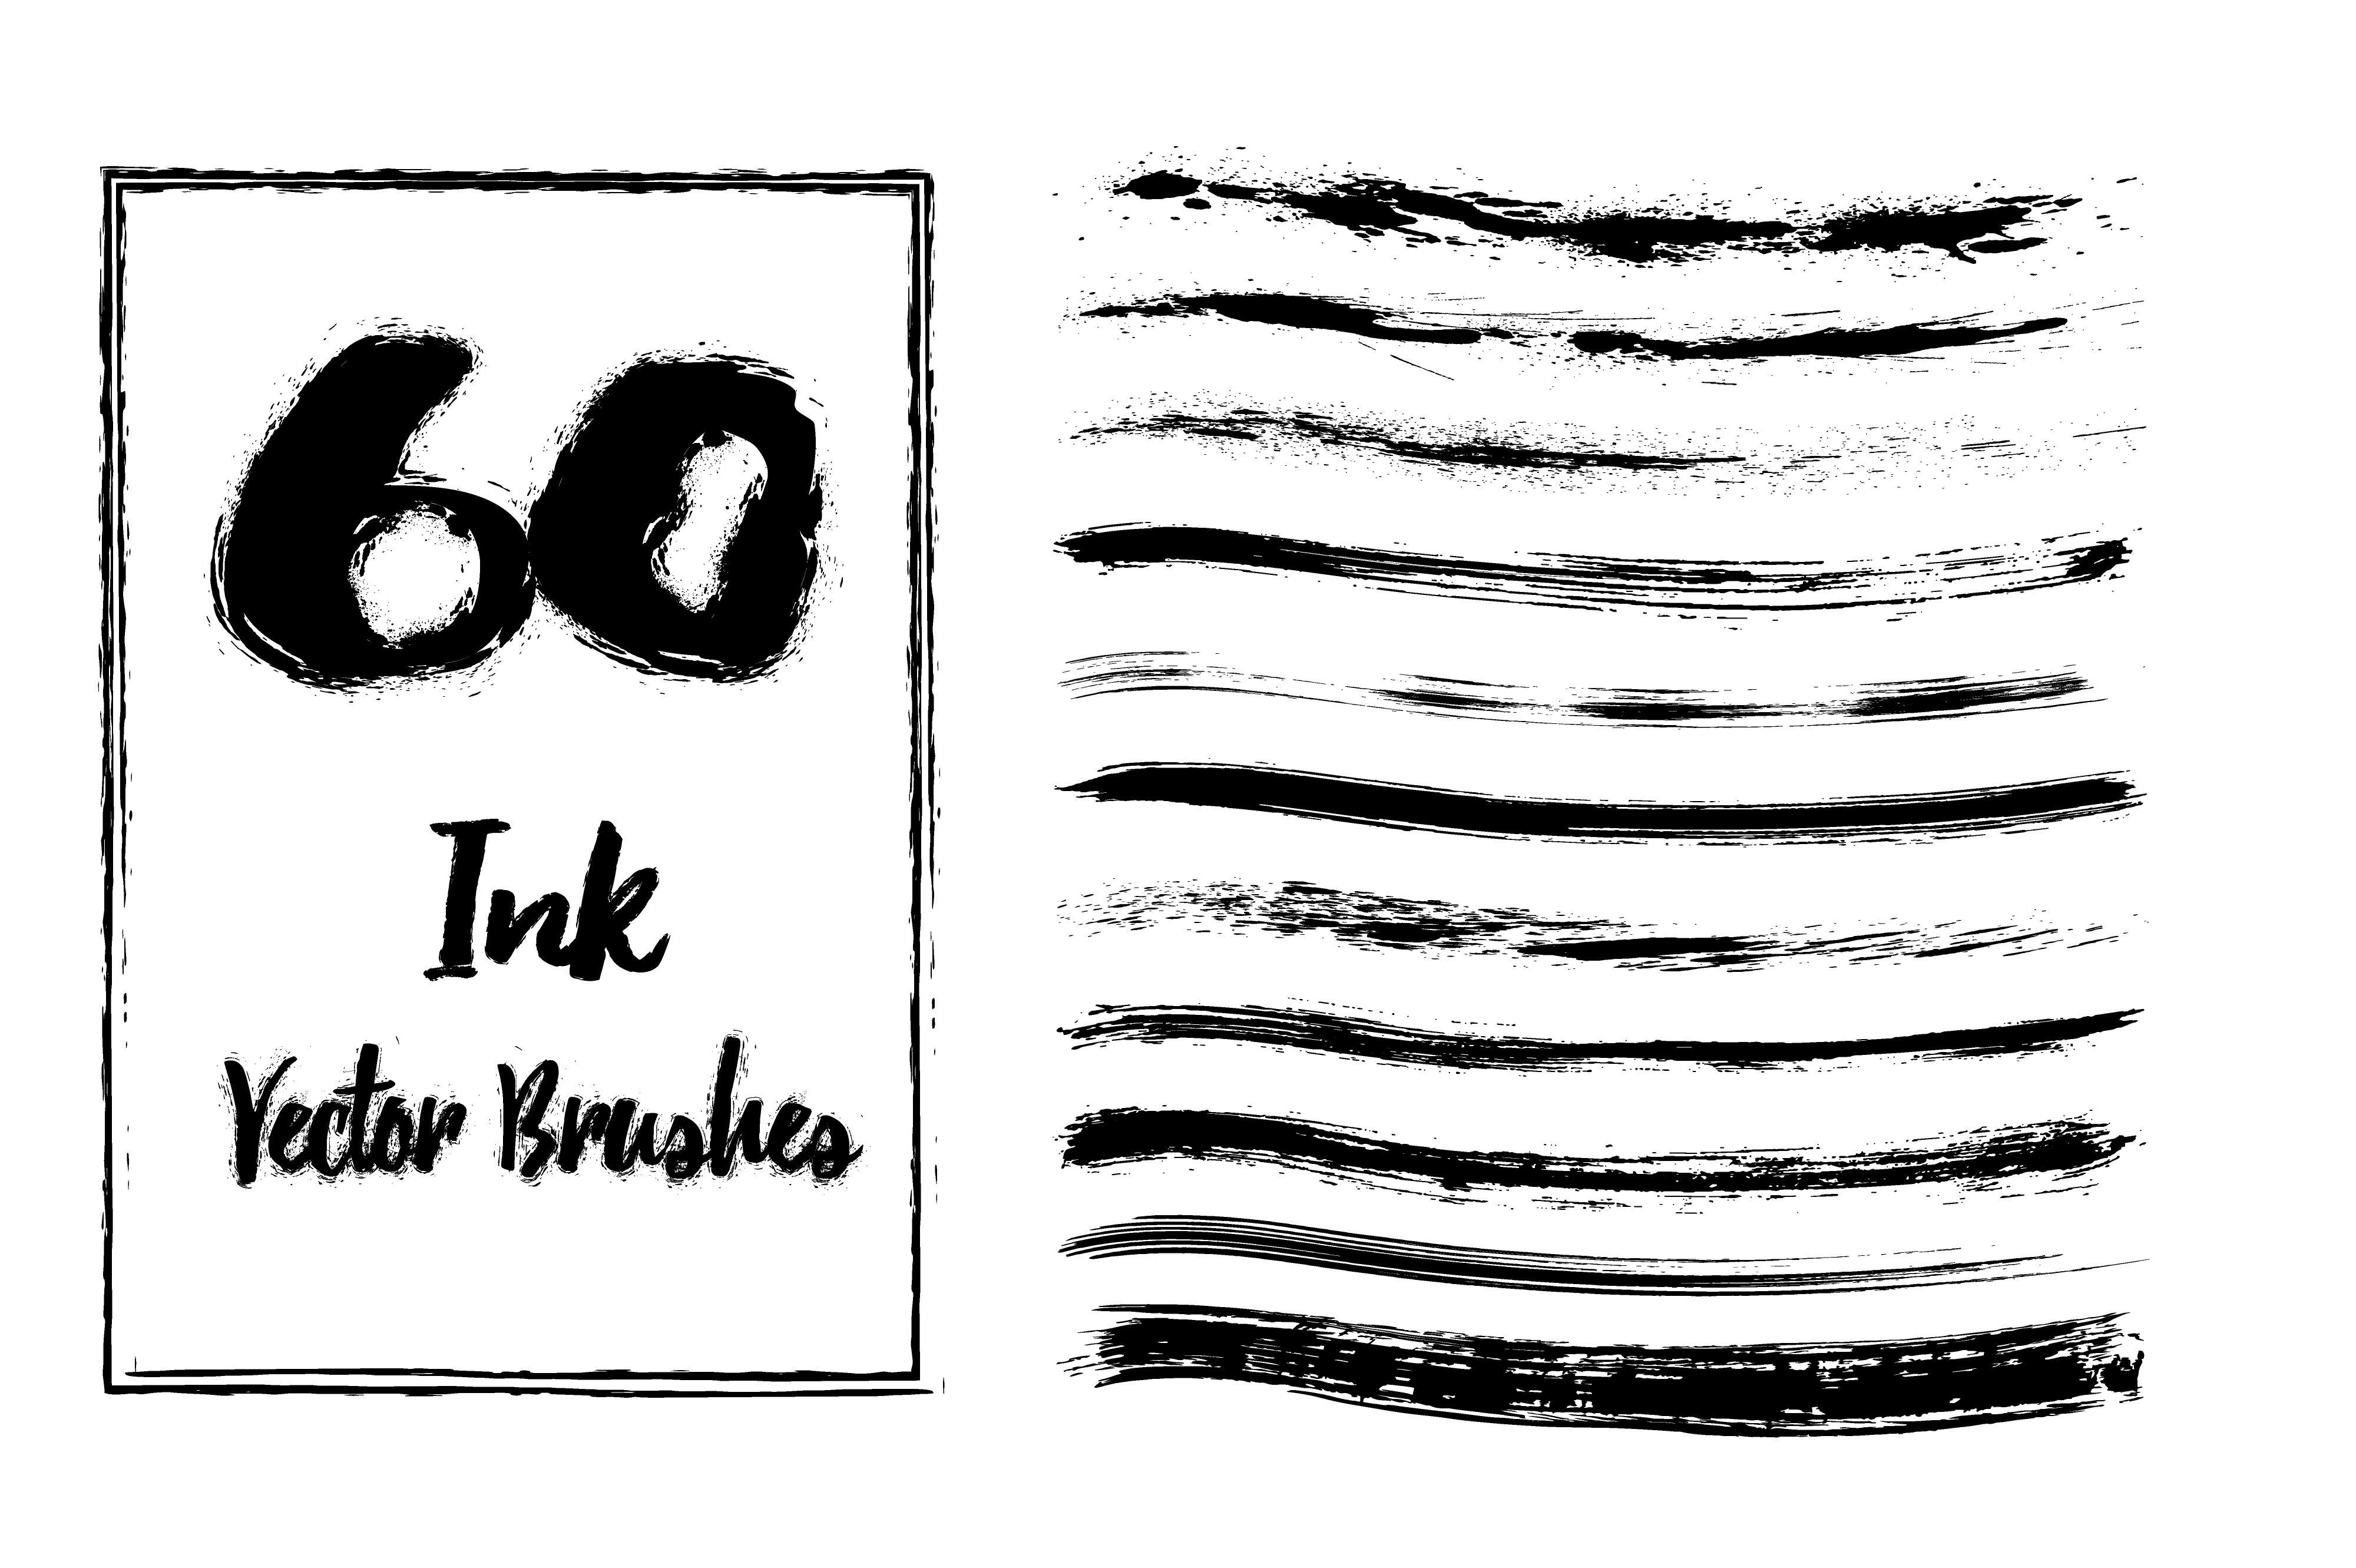 60 Grunge Brushes ~ Illustrator Add-Ons ~ Creative Market